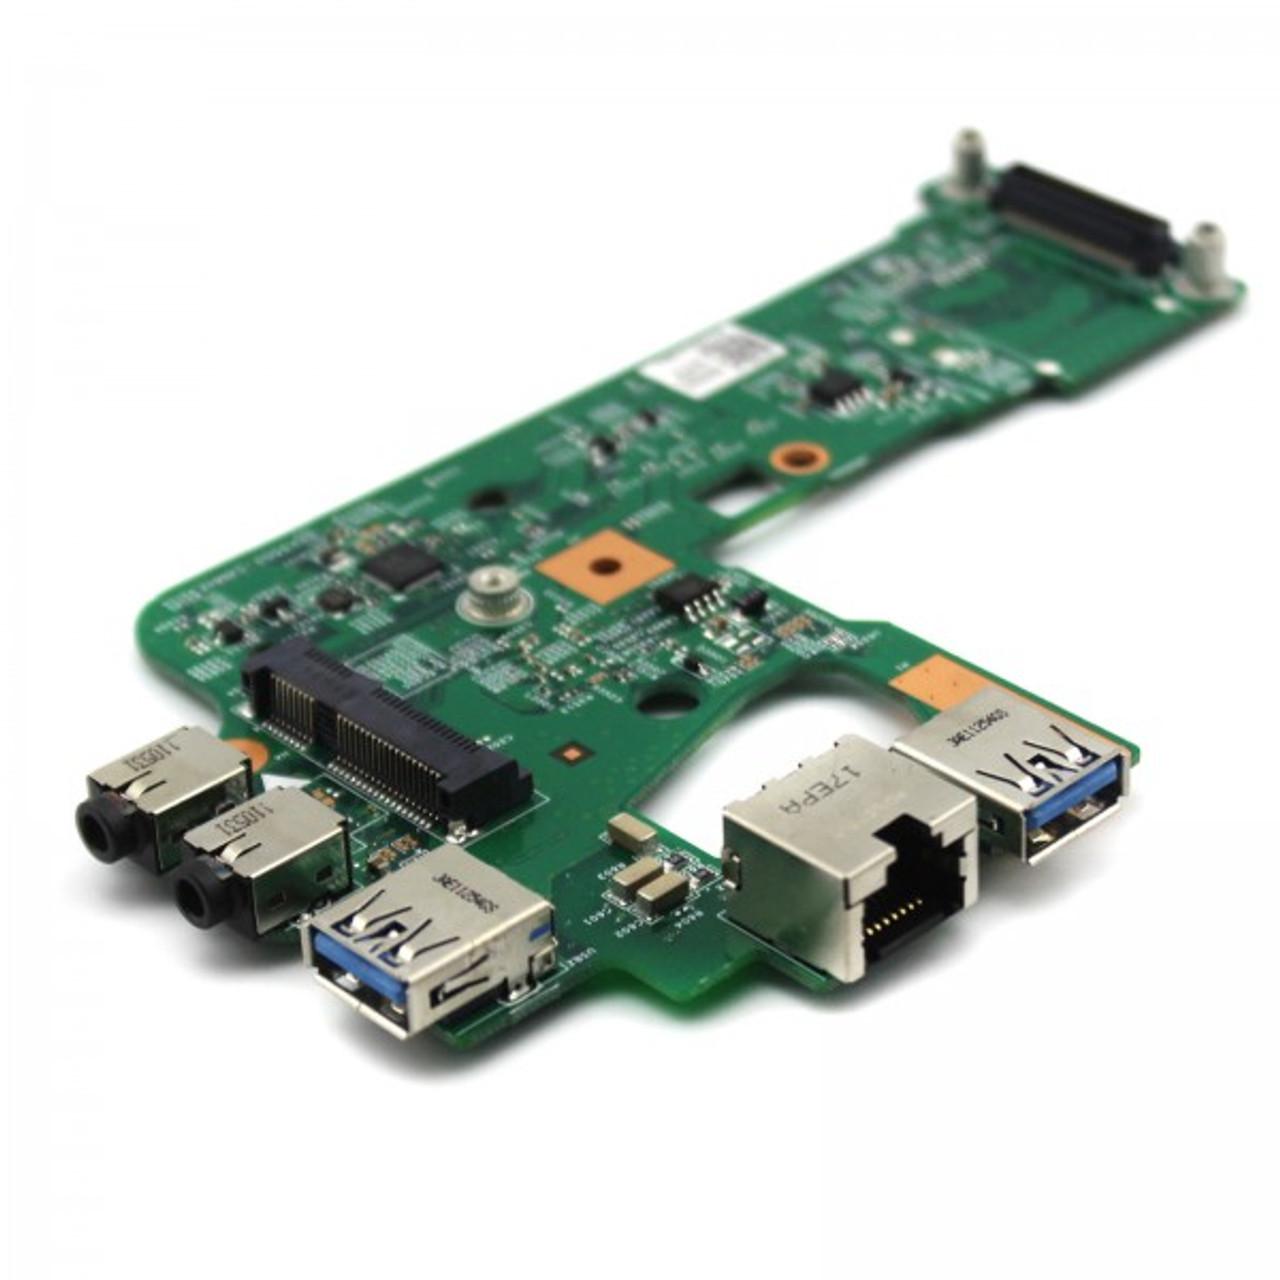 Dell Inspiron N5110 Audio / USB  Circuit Board W/ WWAN Slot - 2F34T